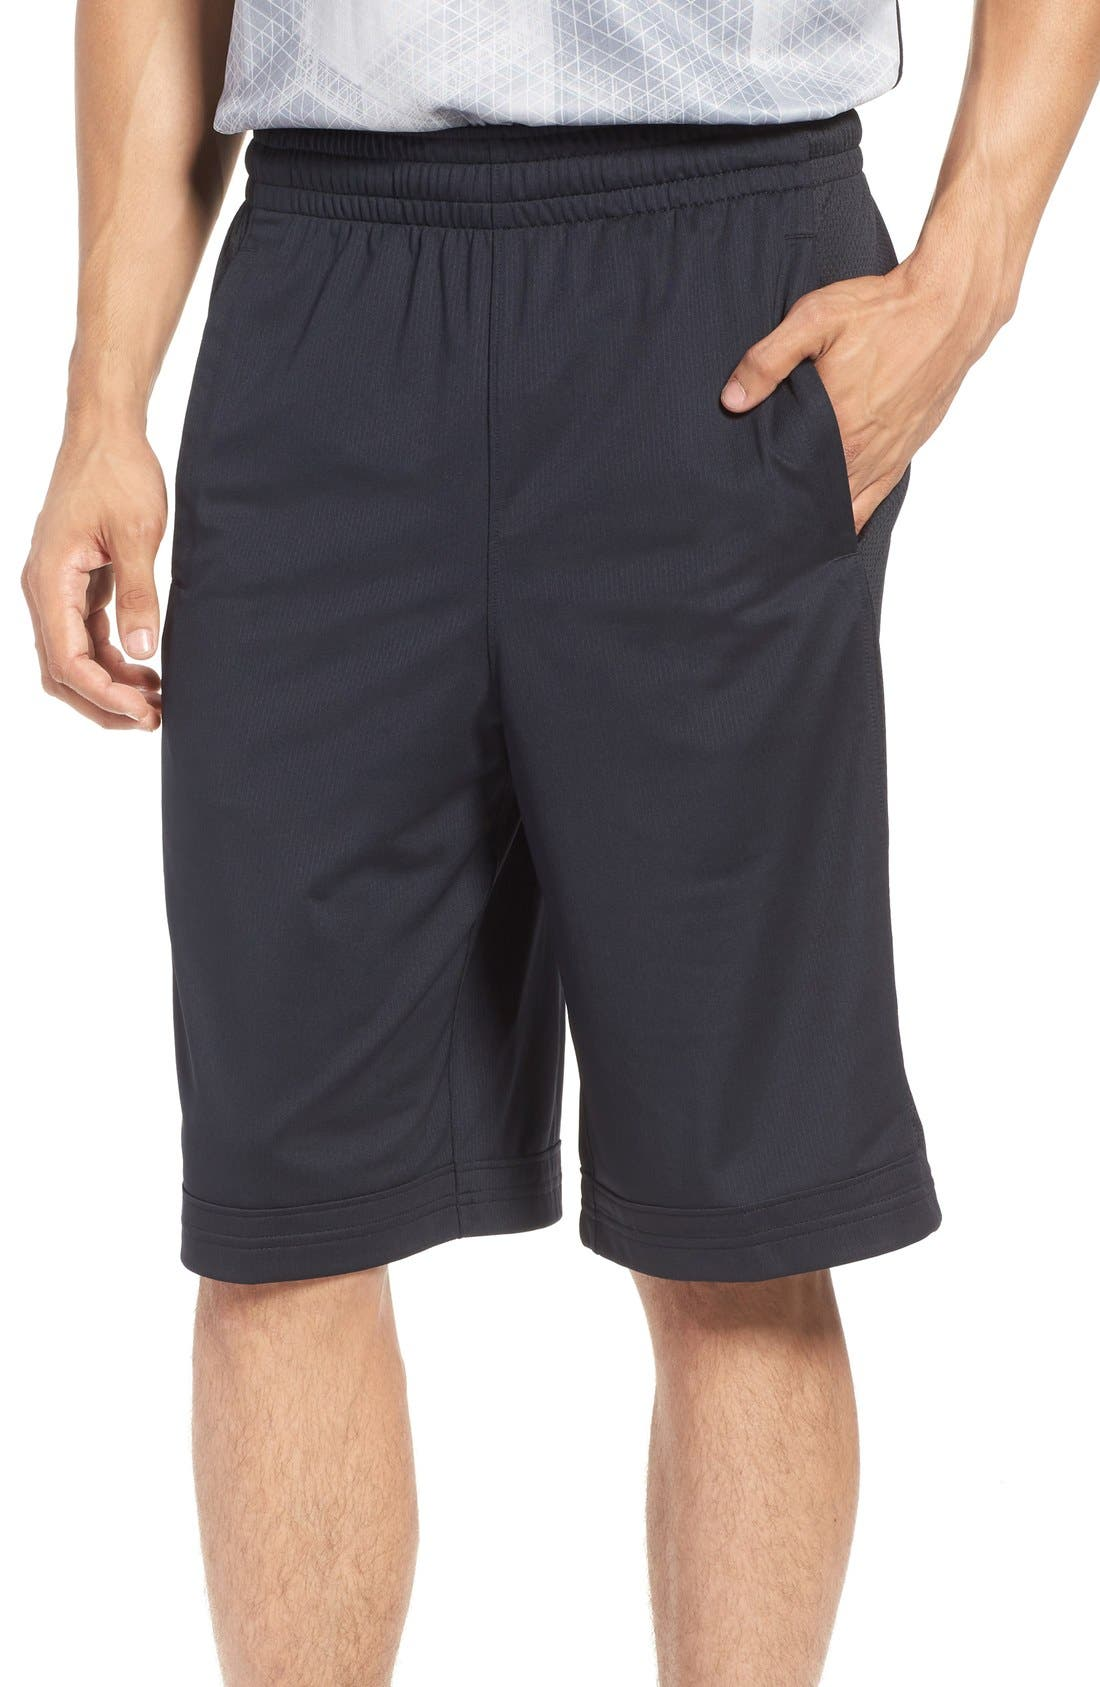 Alternate Image 1 Selected - Under Armour 'Isolation' Athletic Shorts